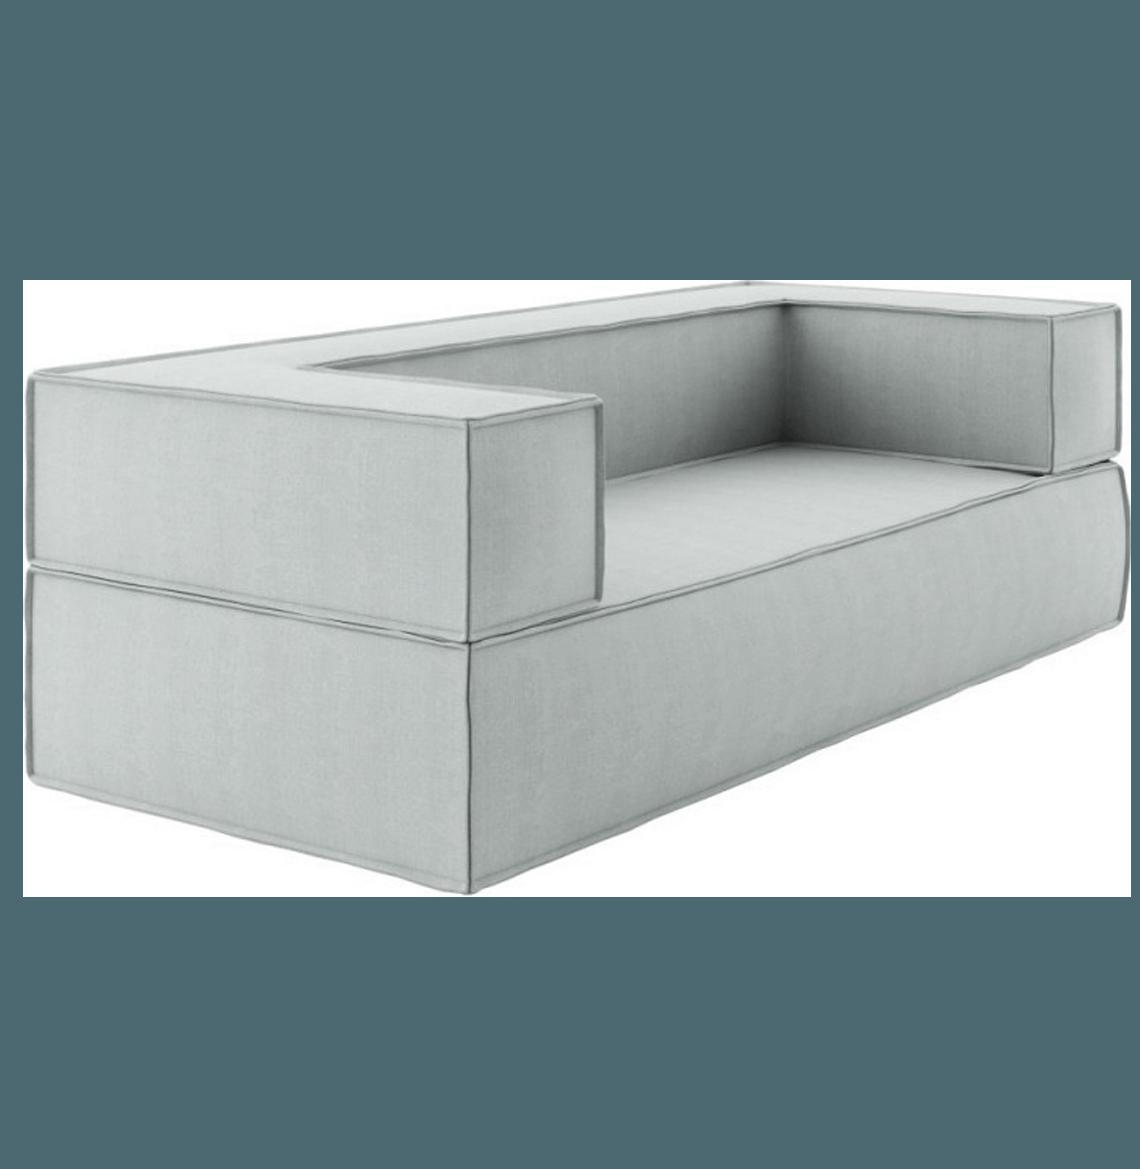 Sofa 200 Basic – Colectia NOI